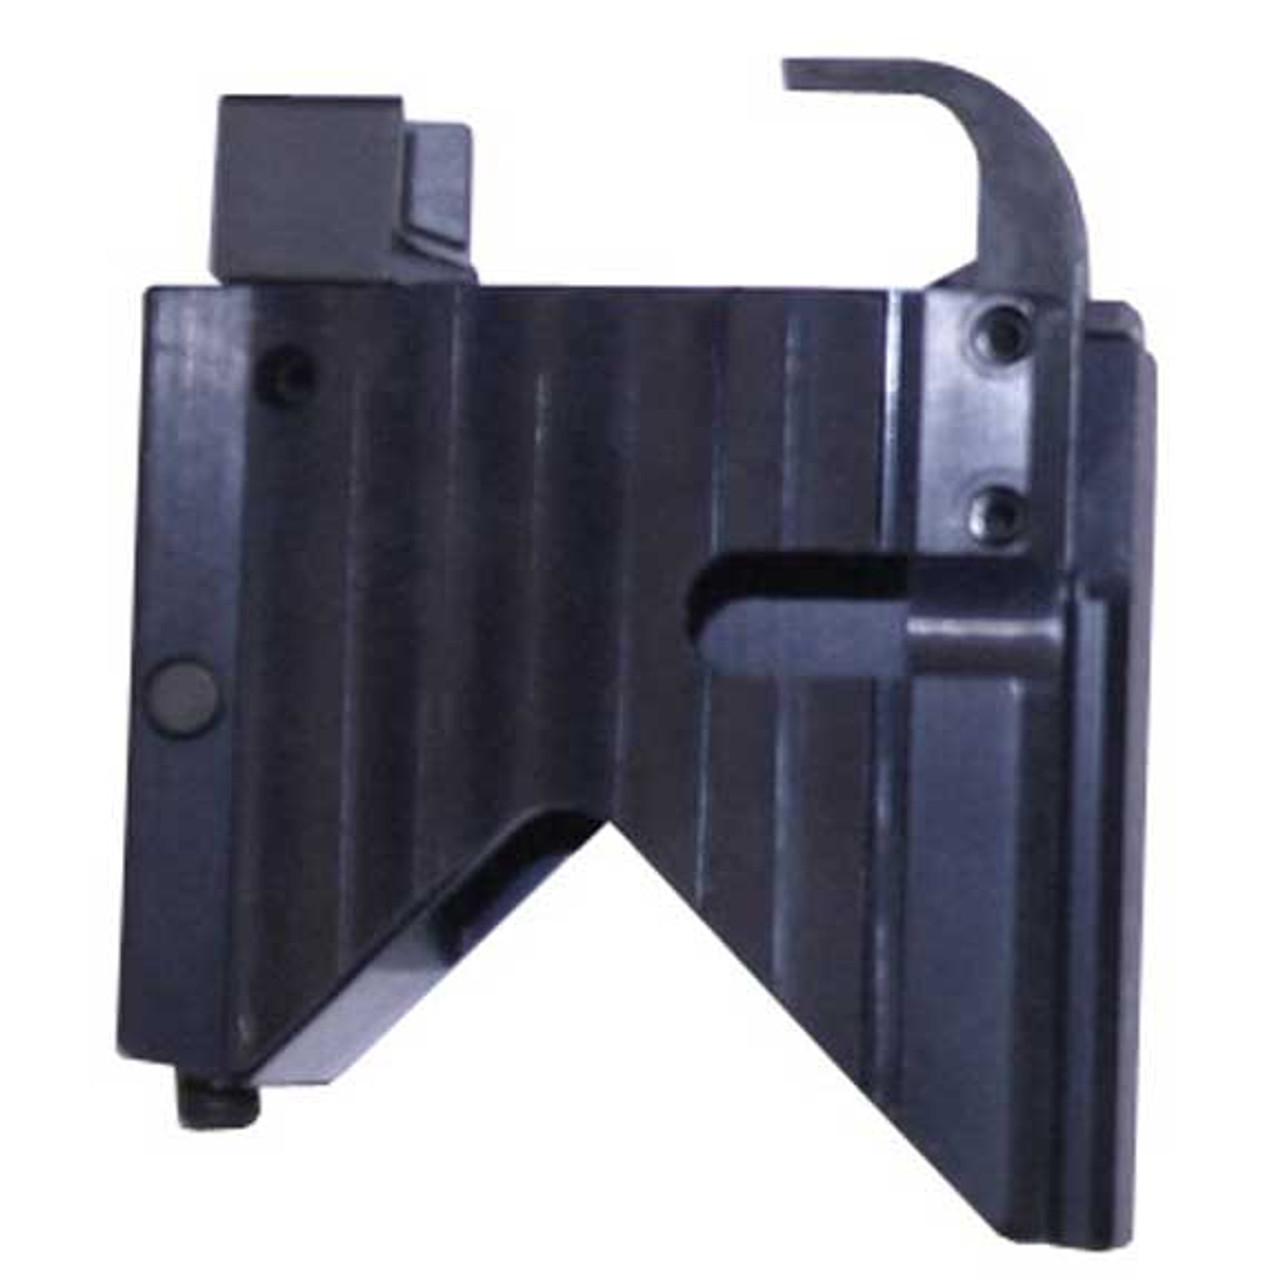 RRA 9mm MagWell Block